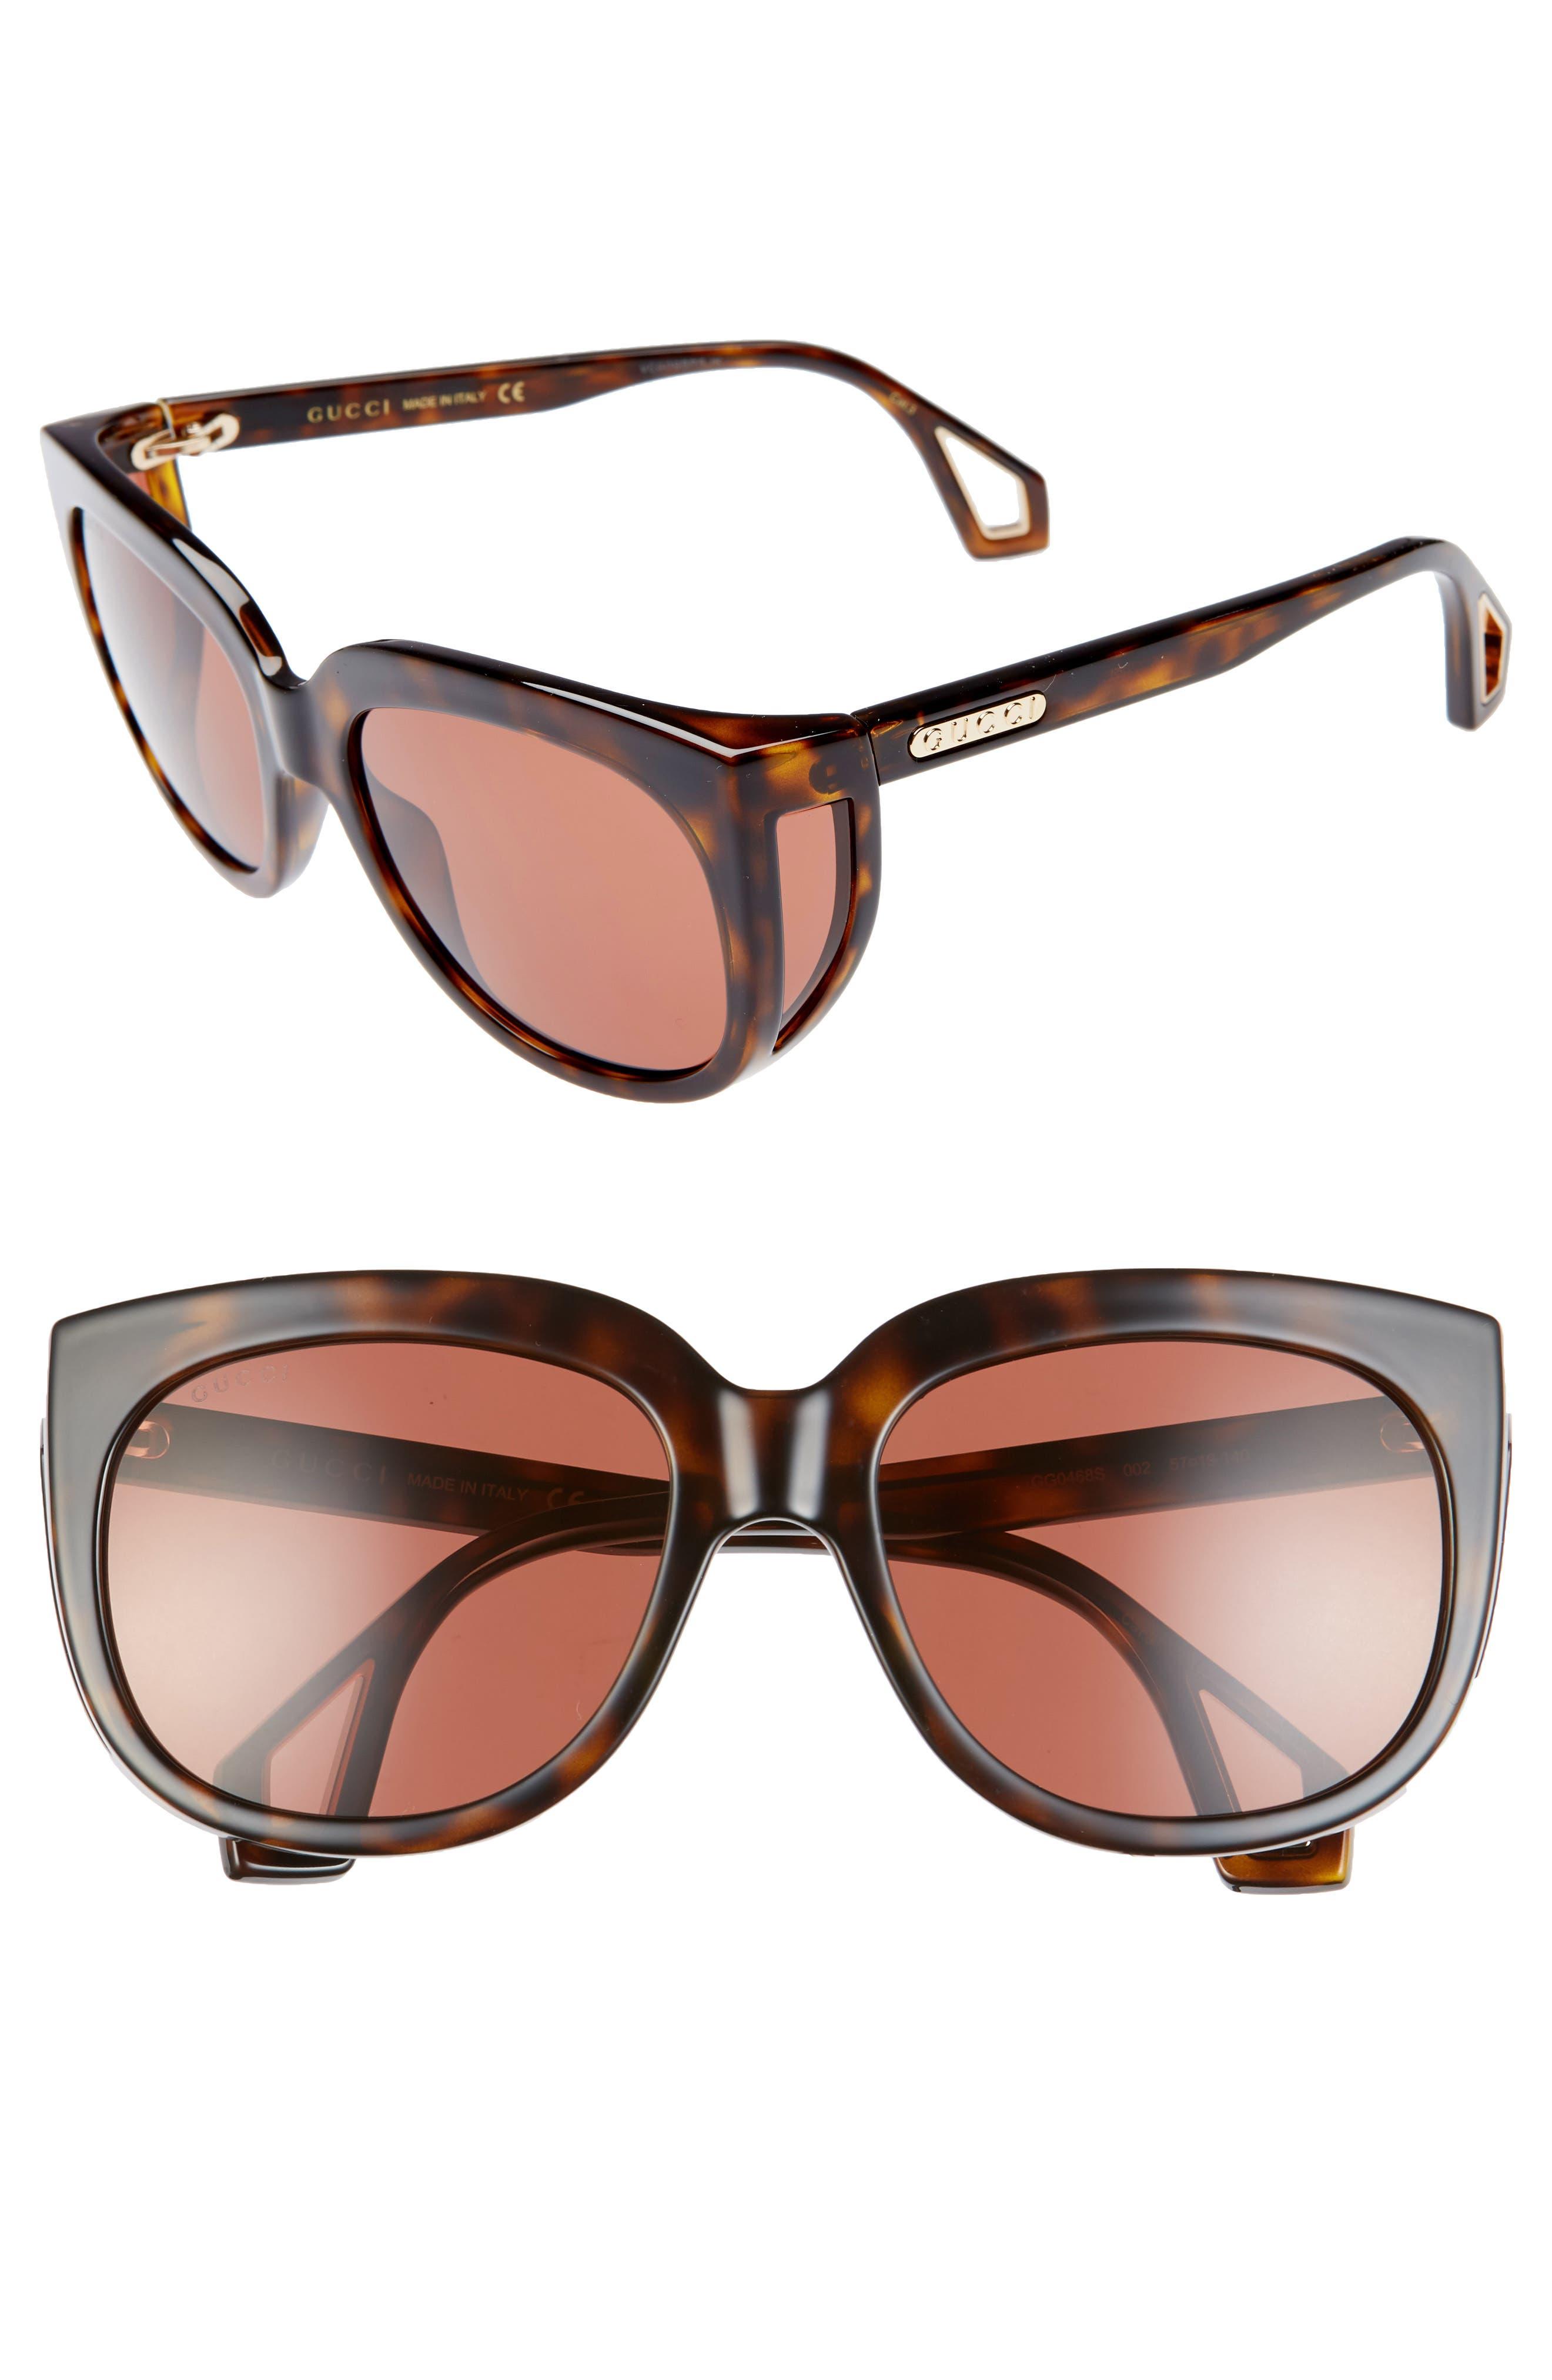 Gucci 57Mm Cat Eye Sunglasses - Shny Dk Hav Mazzu/brn Solid